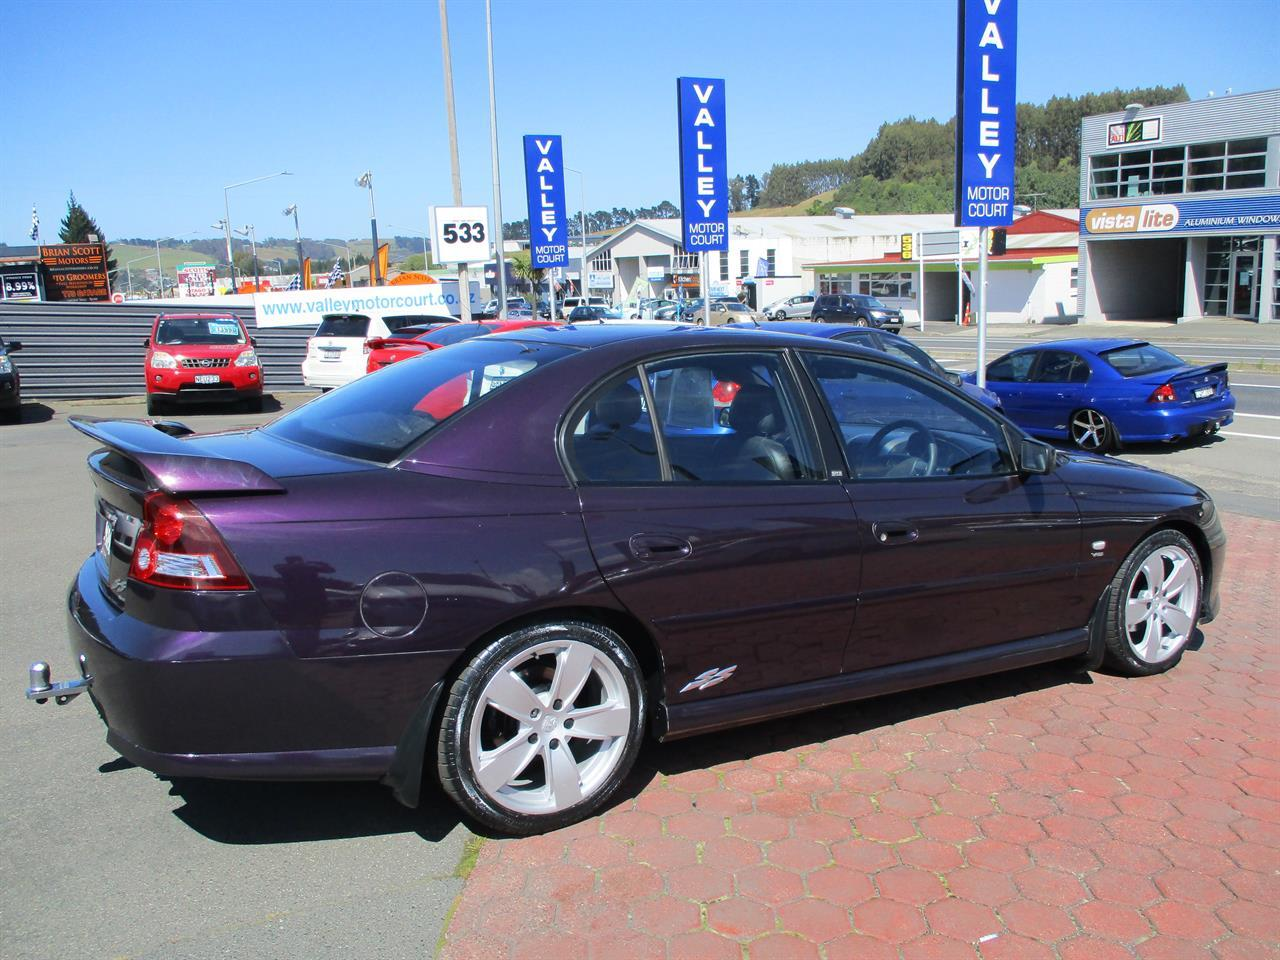 image-3, 2004 Holden Commodore SS AUTO V8 at Dunedin